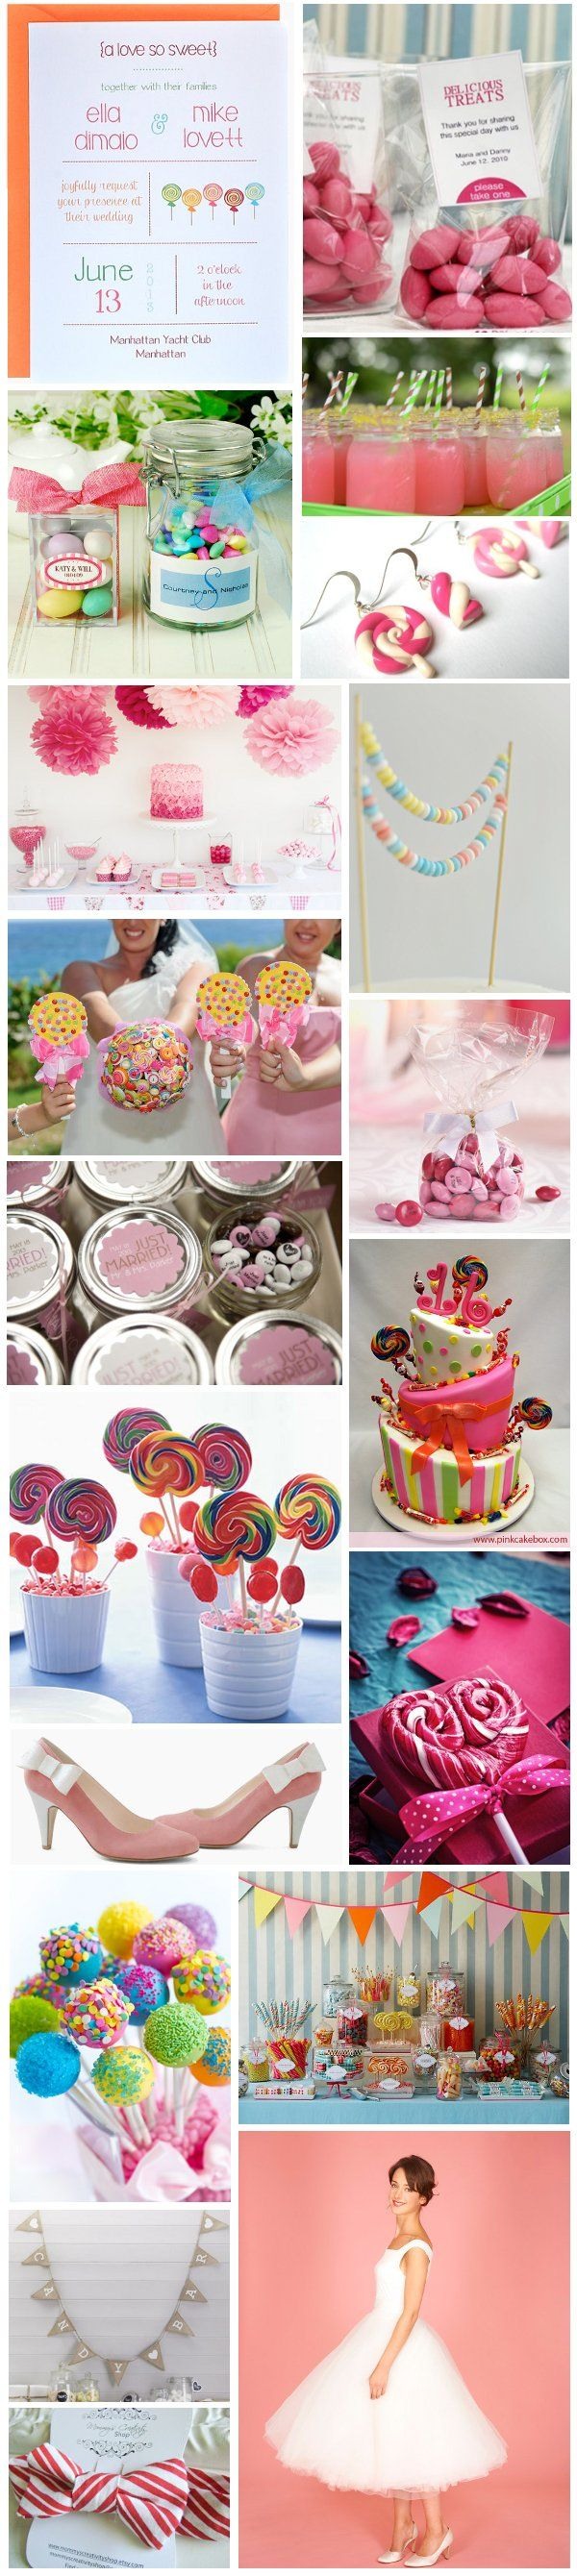 [Inspiration] Candy Wedding